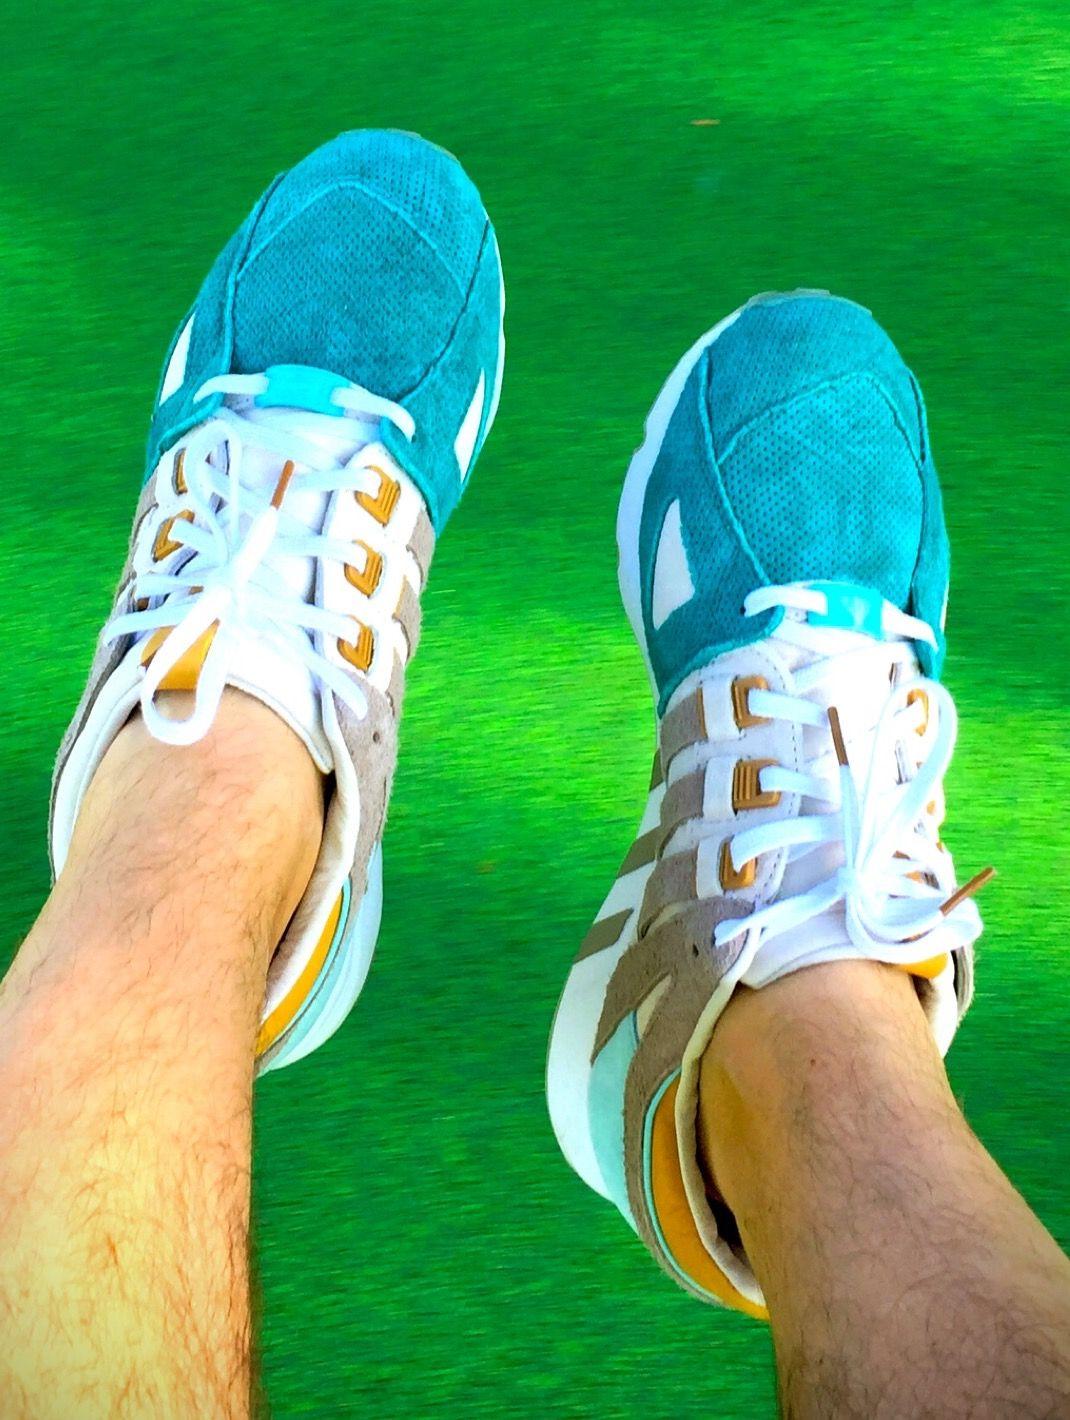 c478b70d7dbb Sneakers76 x adidas Consortium EQT Running Support